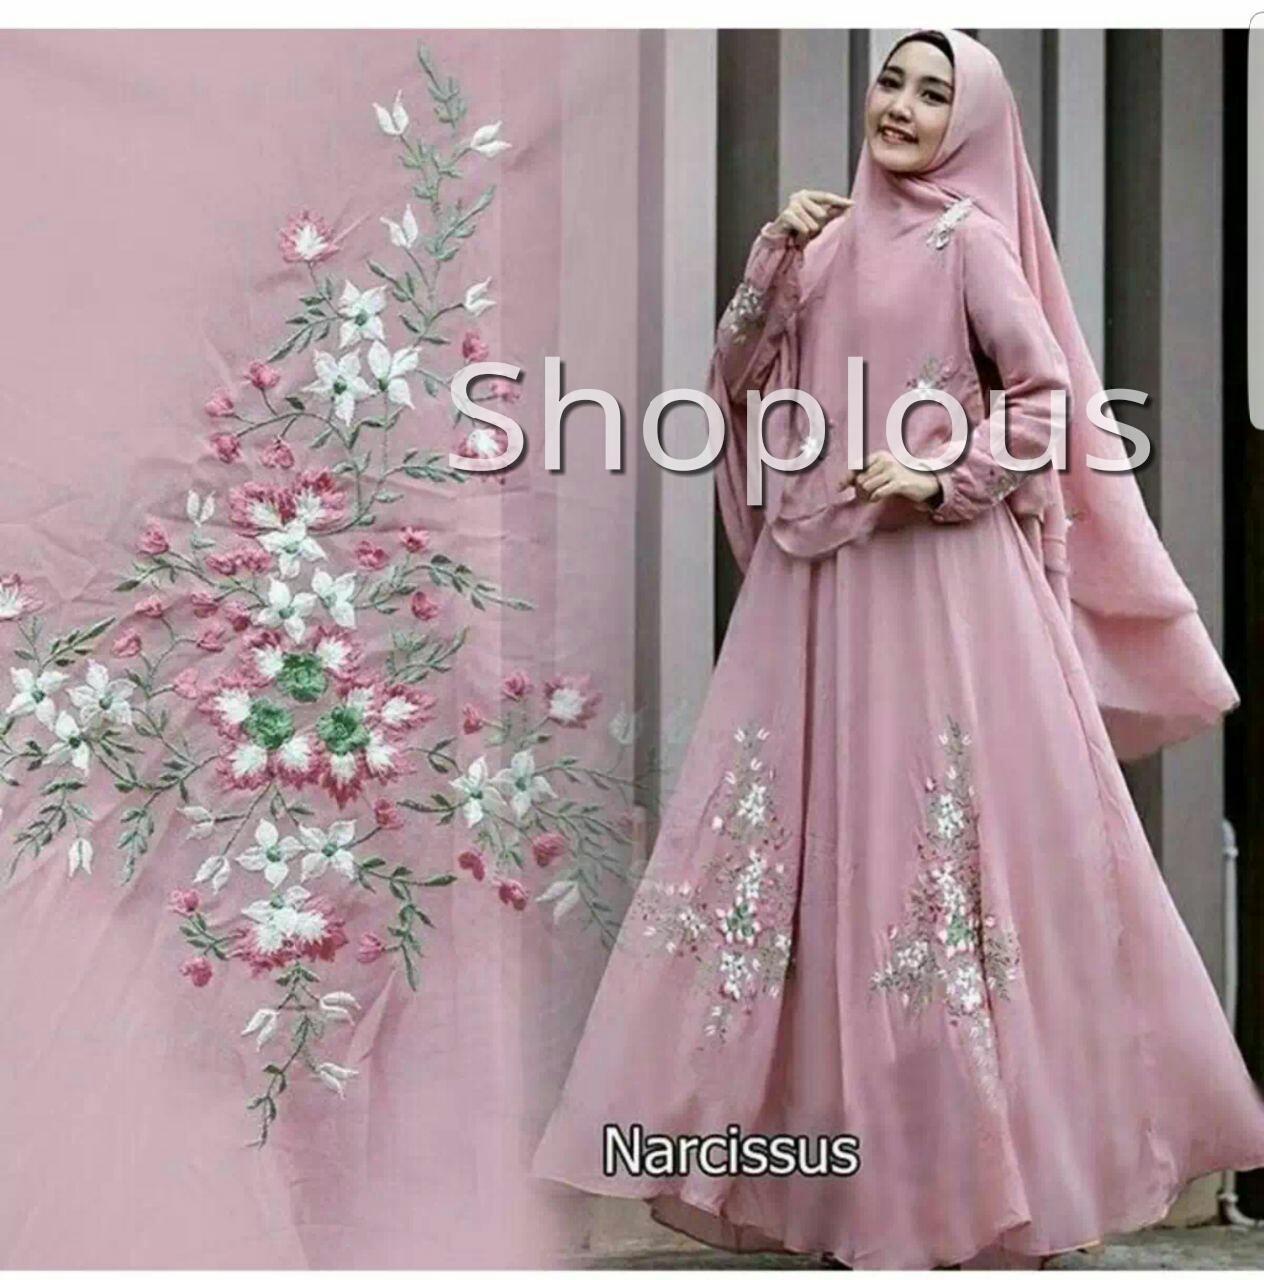 Shoplous Baju Gamis Maxi Dress Muslim Wanita Narcissus Syari ( Dapat Jilbab ) / Dress Muslim / Gamis Wanita / Baju Muslim / Hijab Muslim / Fashion Muslim / Syar'i Muslim / Maxi Dress Lengan Panjang / Gamis Modern